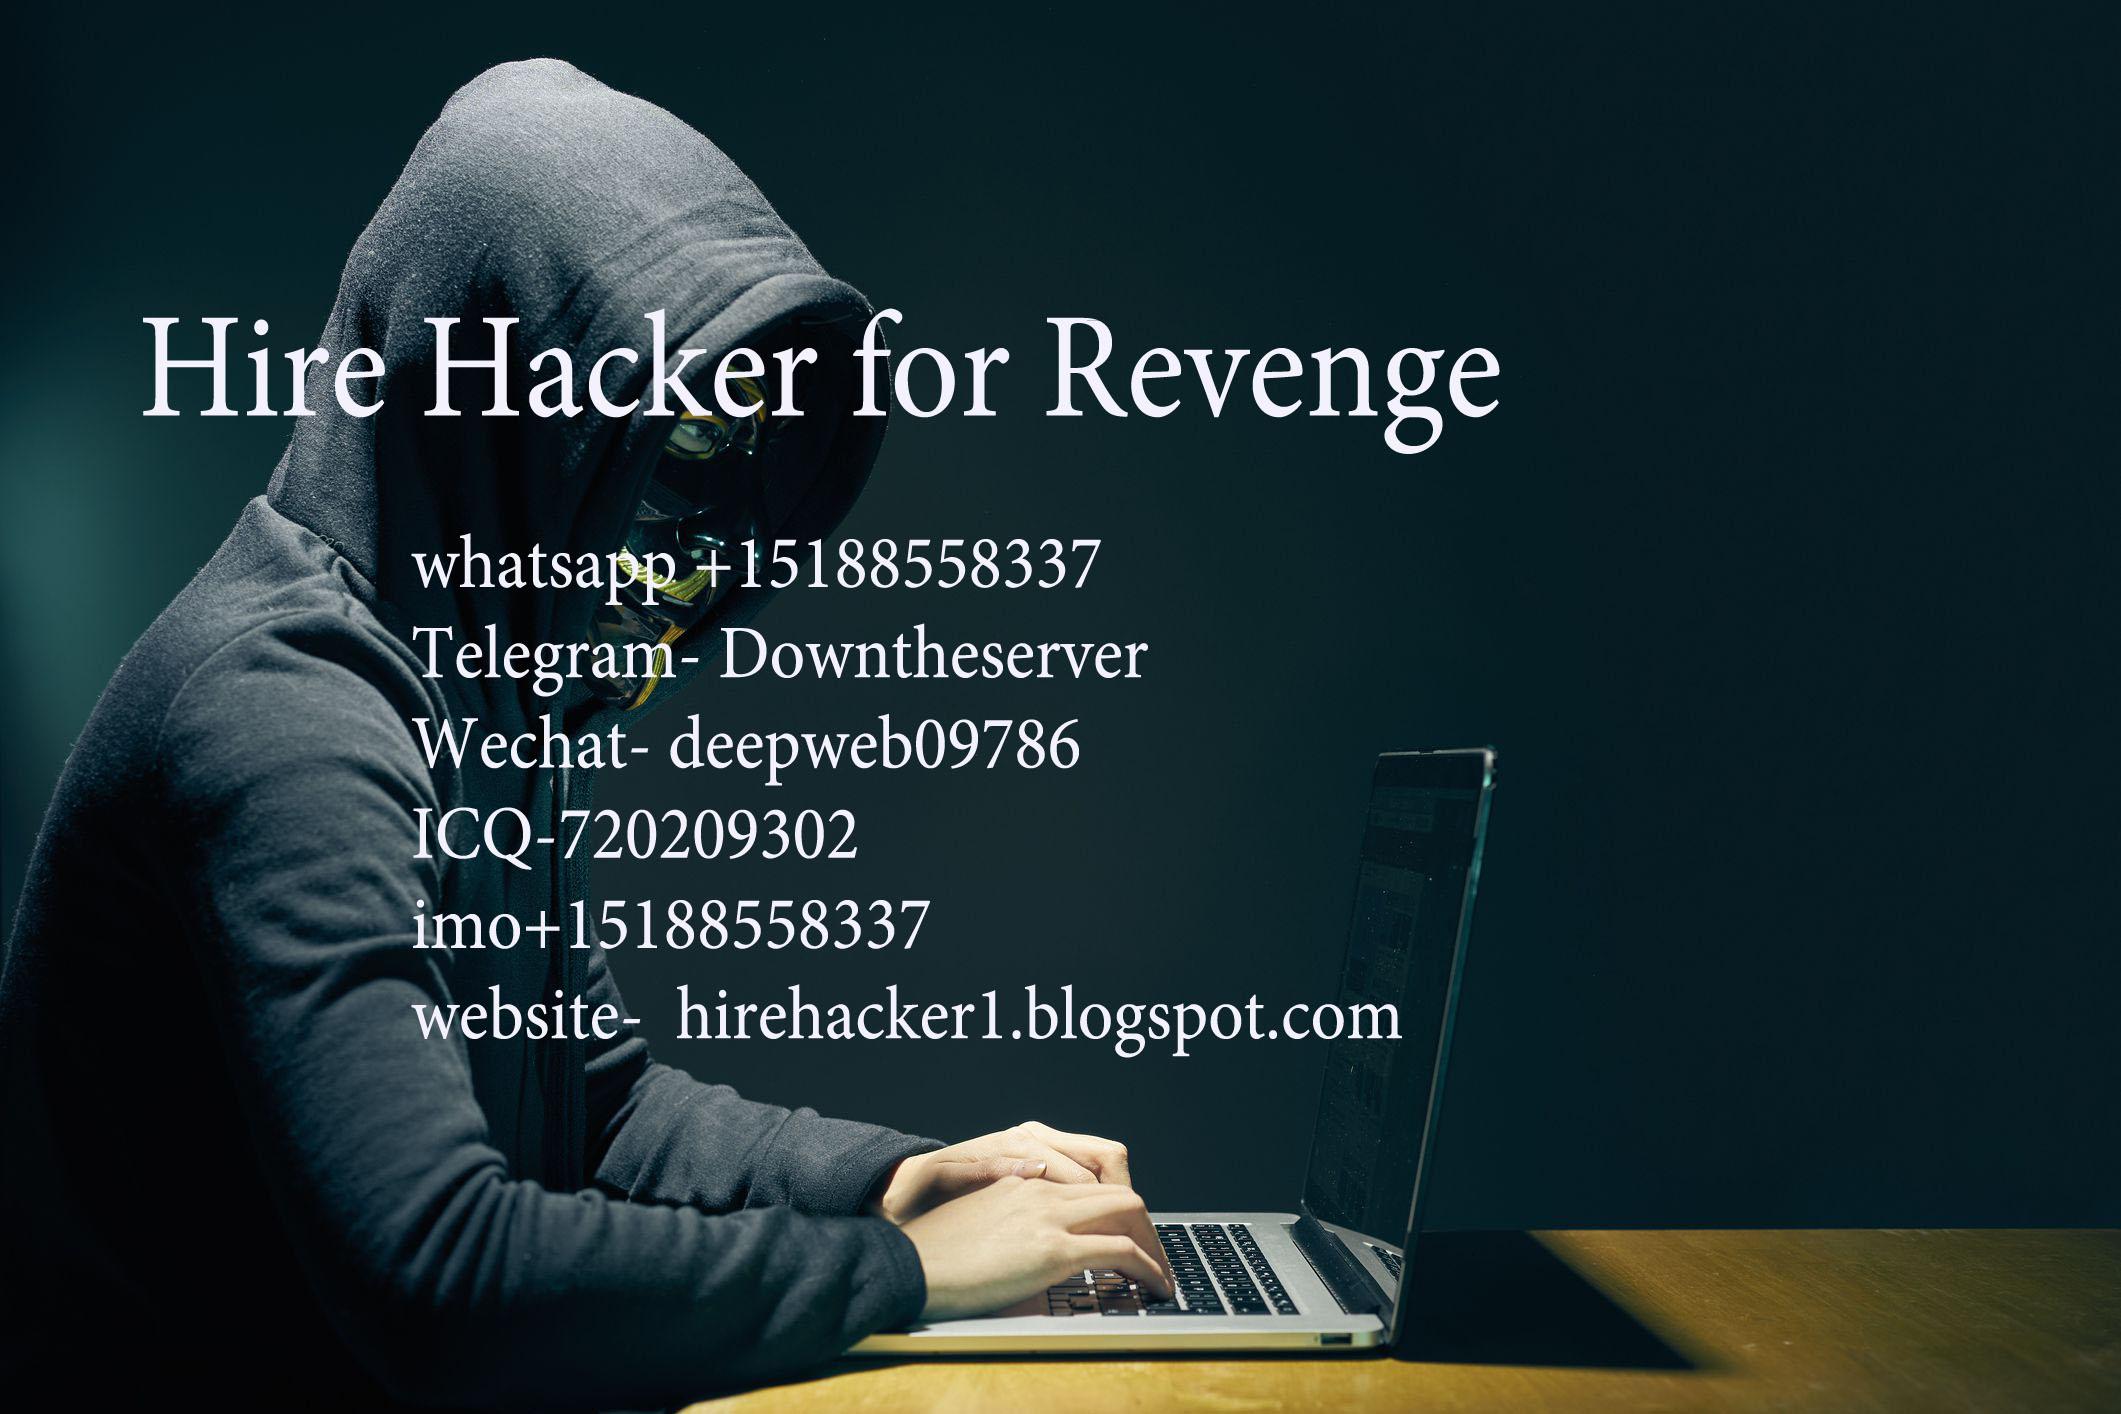 Hire Hacker